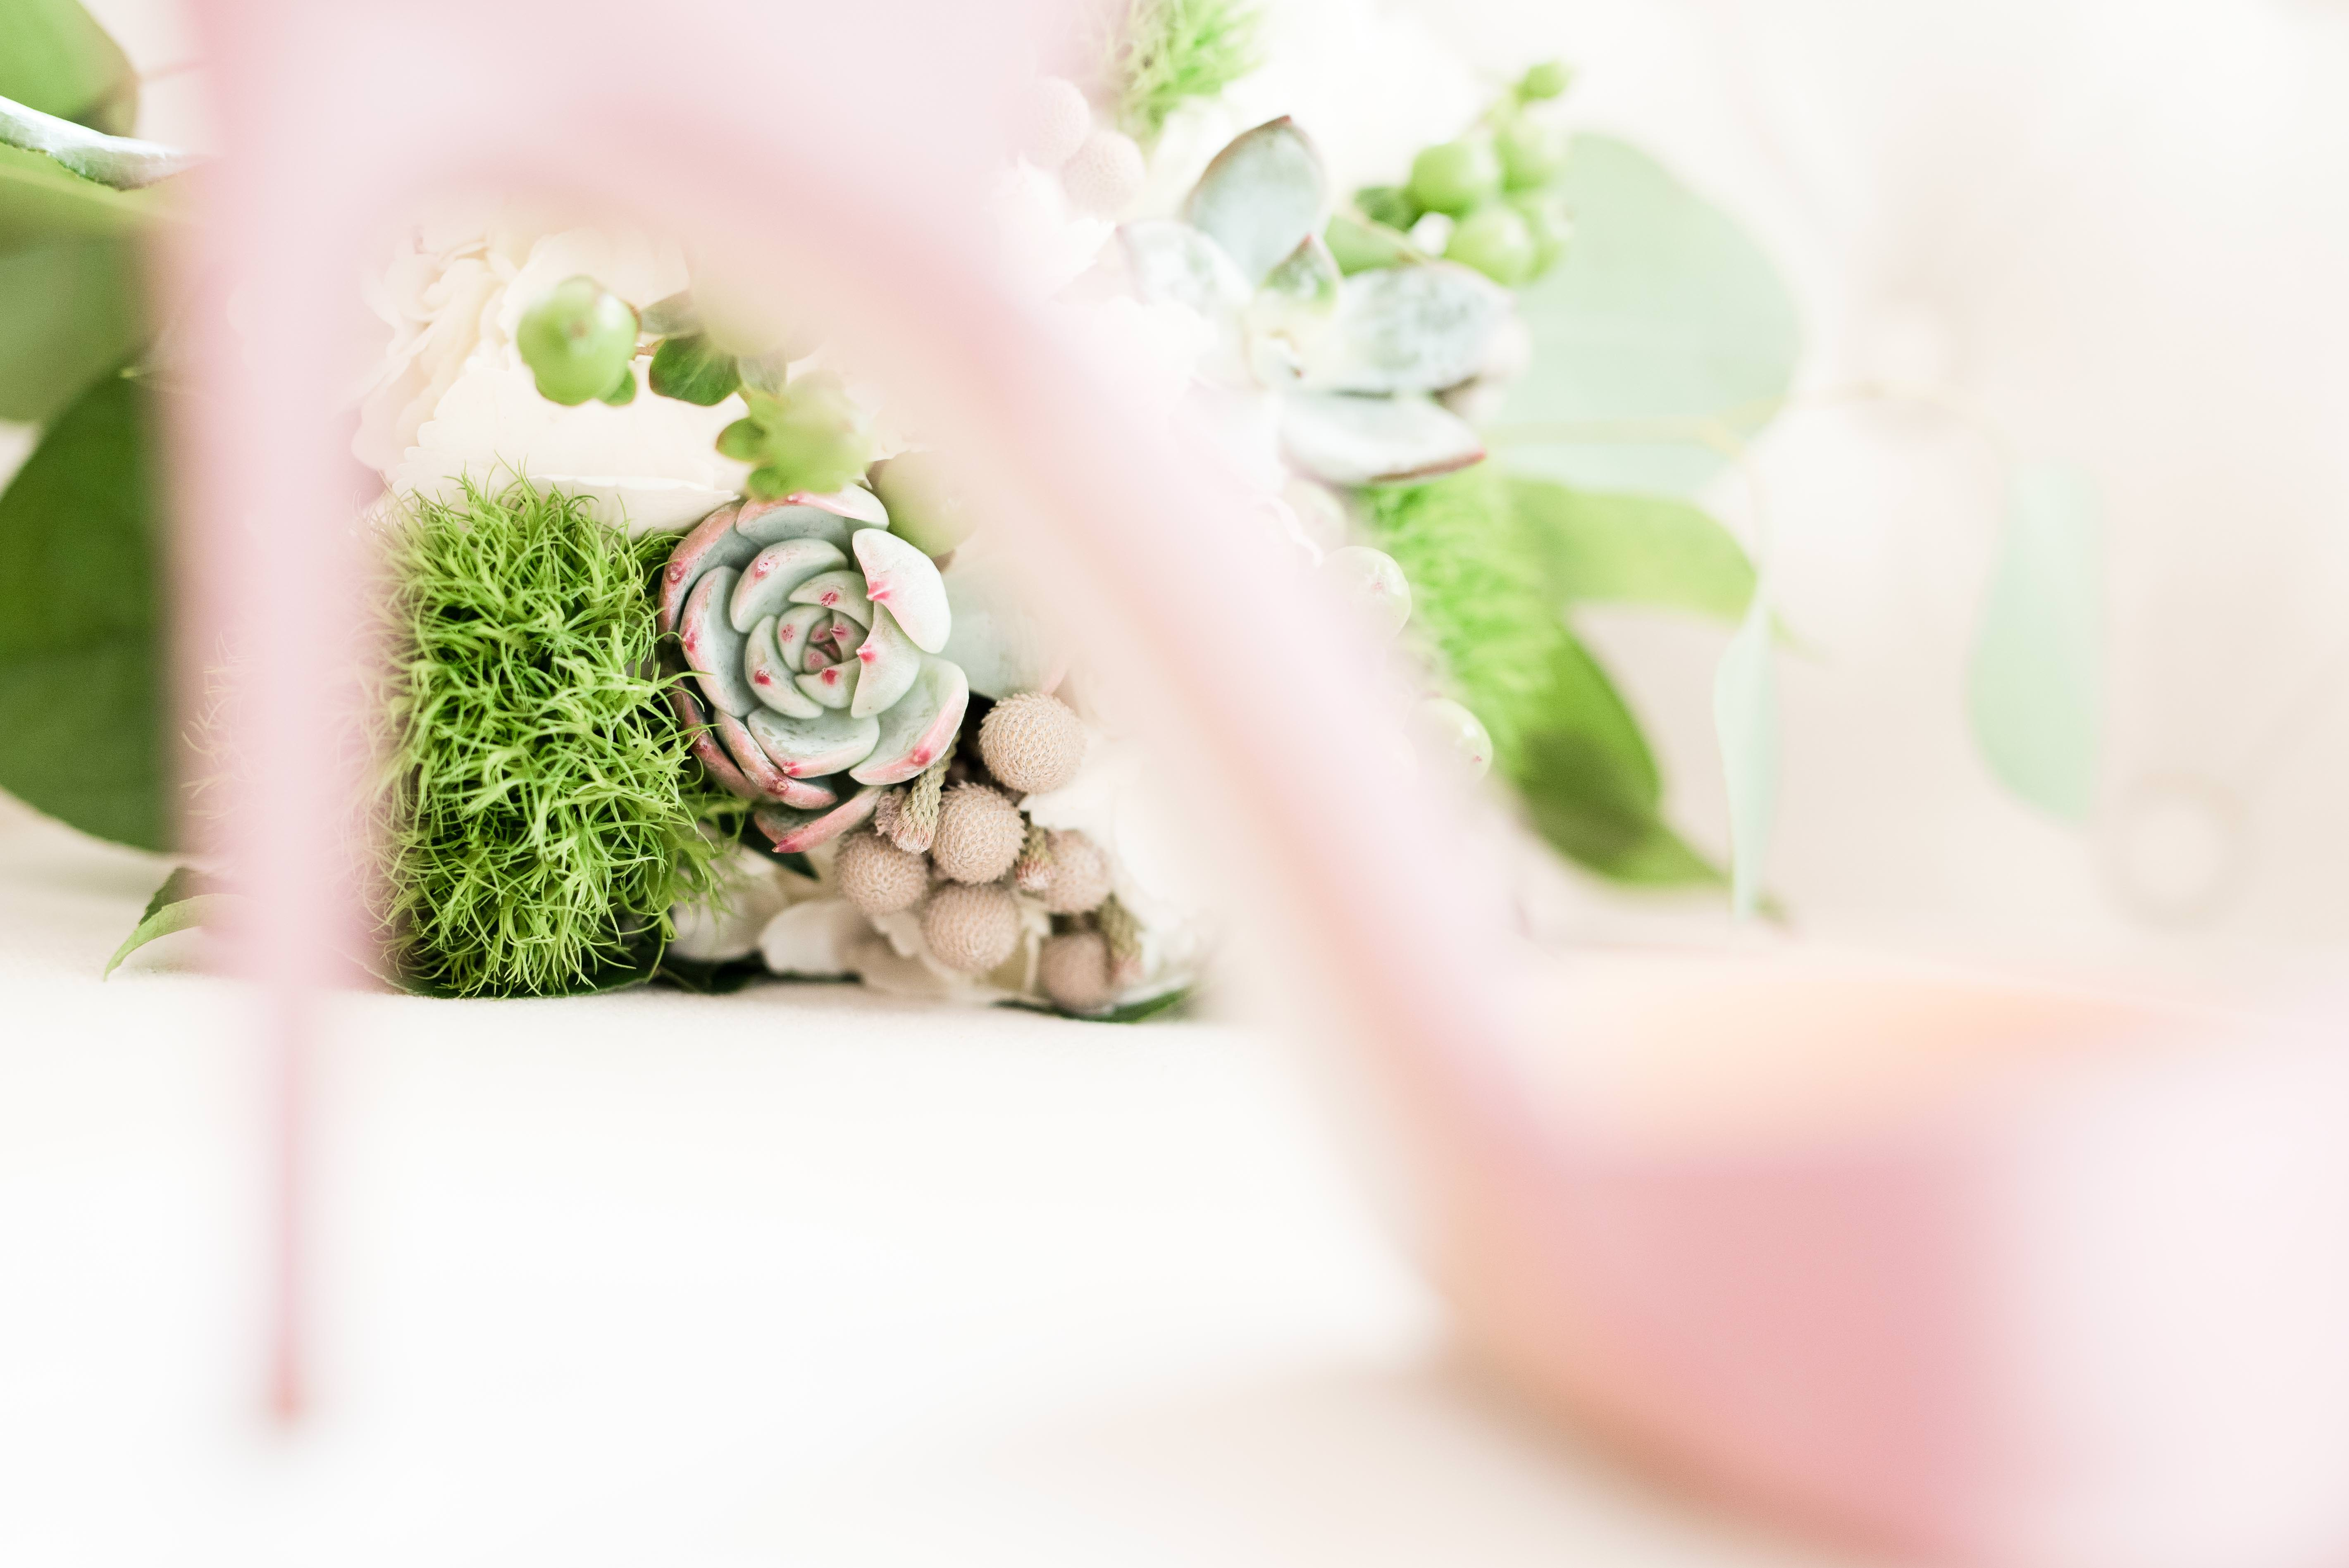 bridal bouquet ideas, weddings from Gibbet Hill in Groton, MA, Groton wedding photographer, succulent bridal bouquet ideas